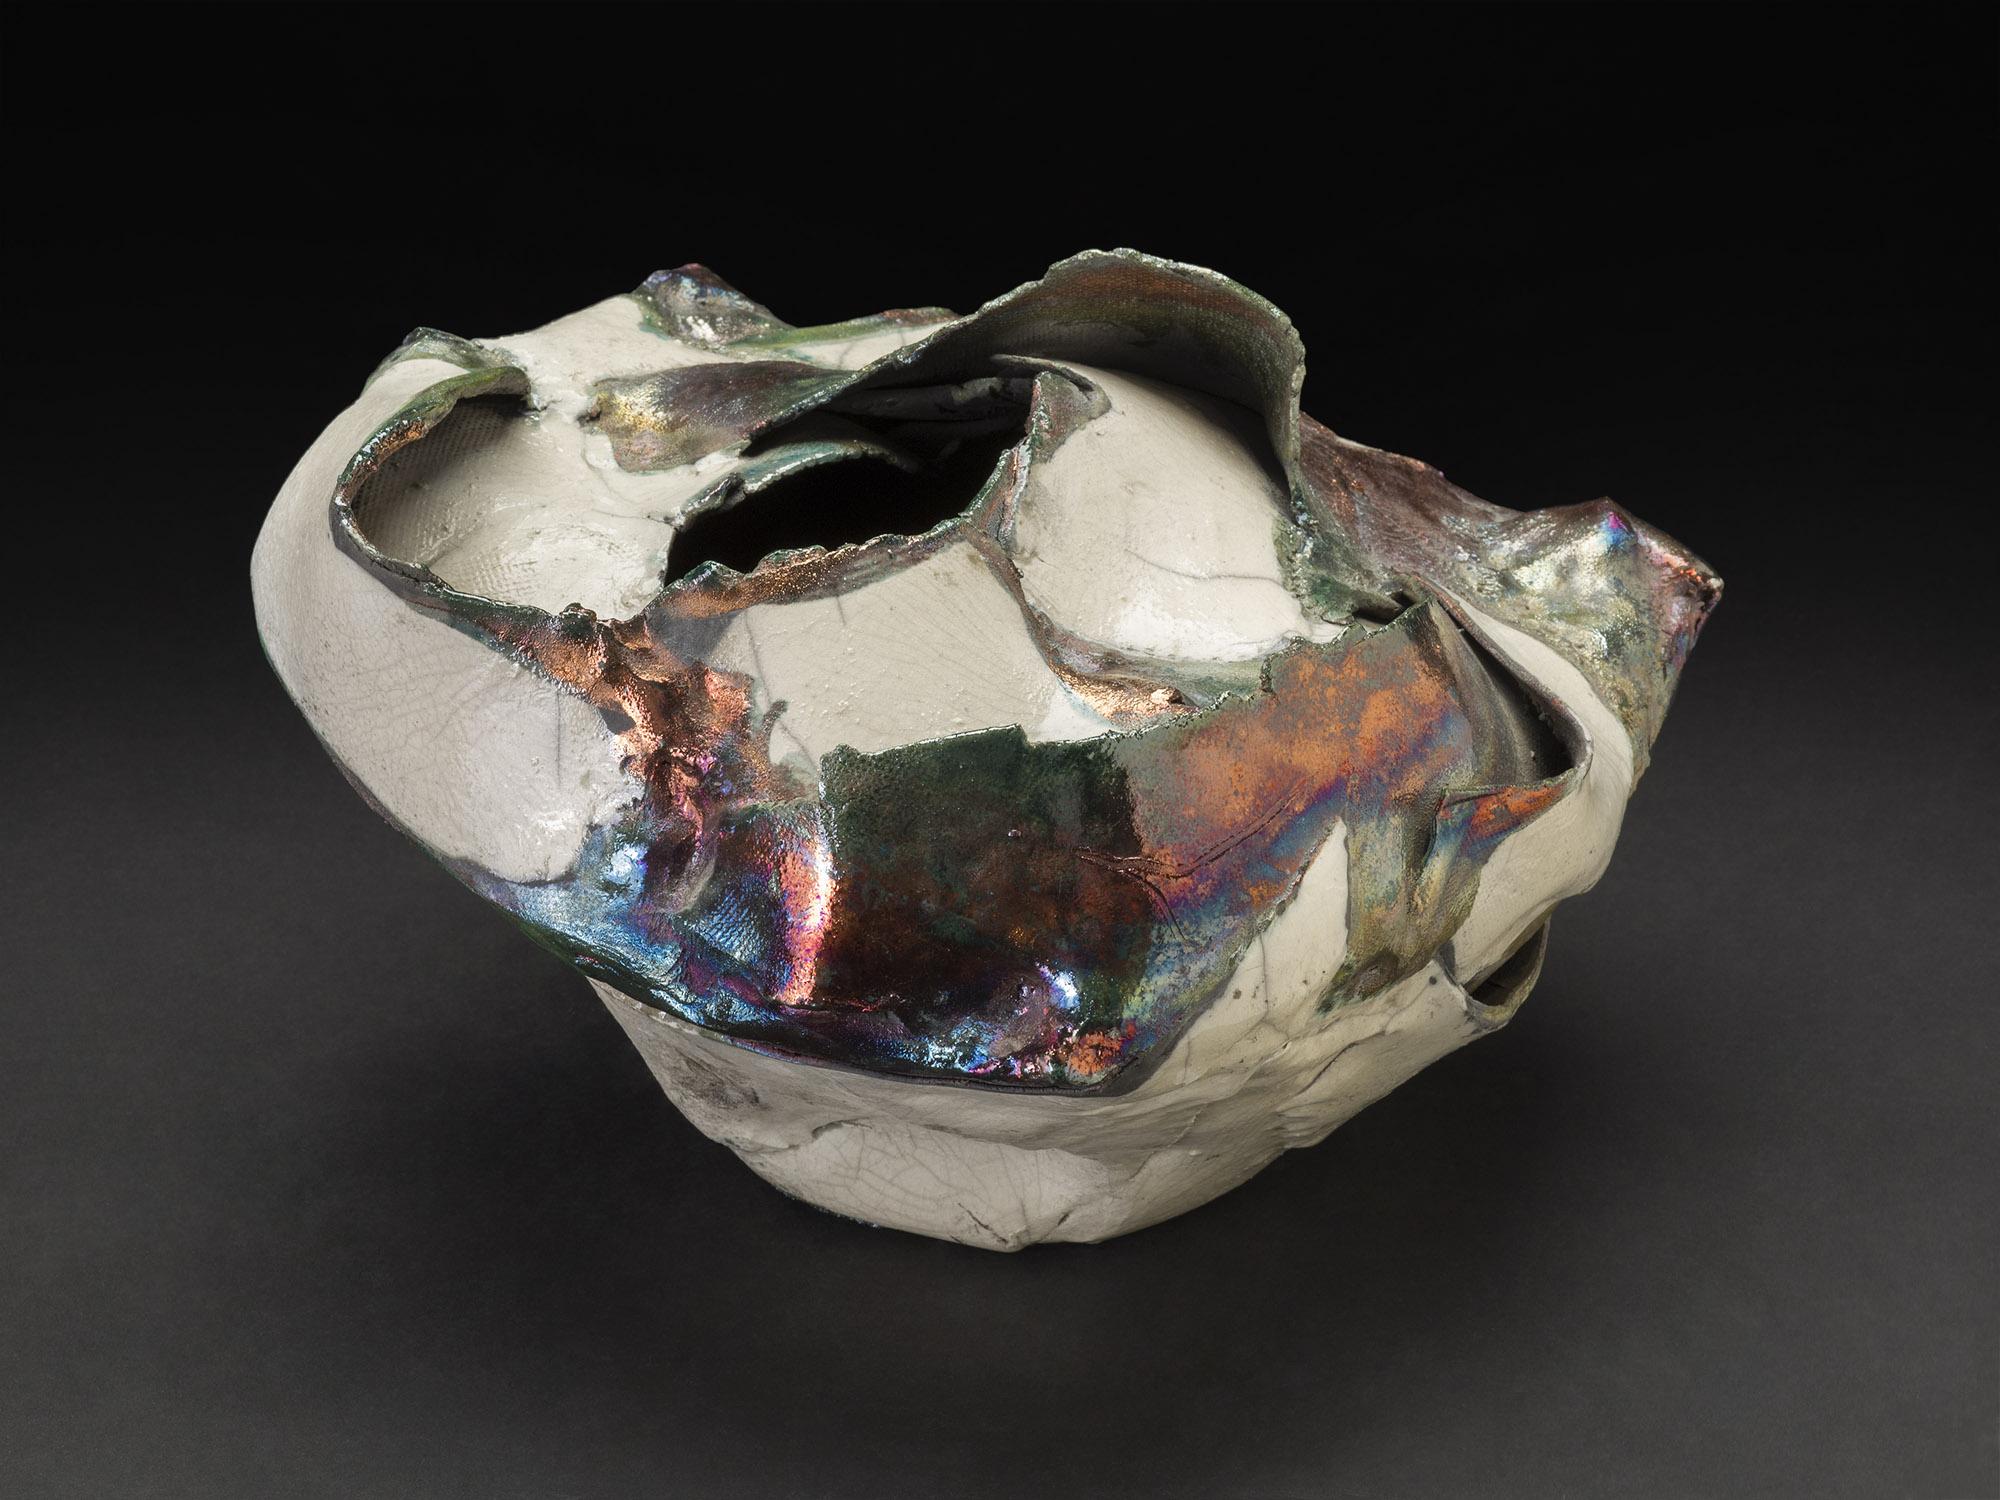 Nancy Brorby    Untitled  , c. 1992-2004 Ceramic 11 x 10.5 x 7 inches 27.9 x 26.7 x 17.8 cm NBr 8